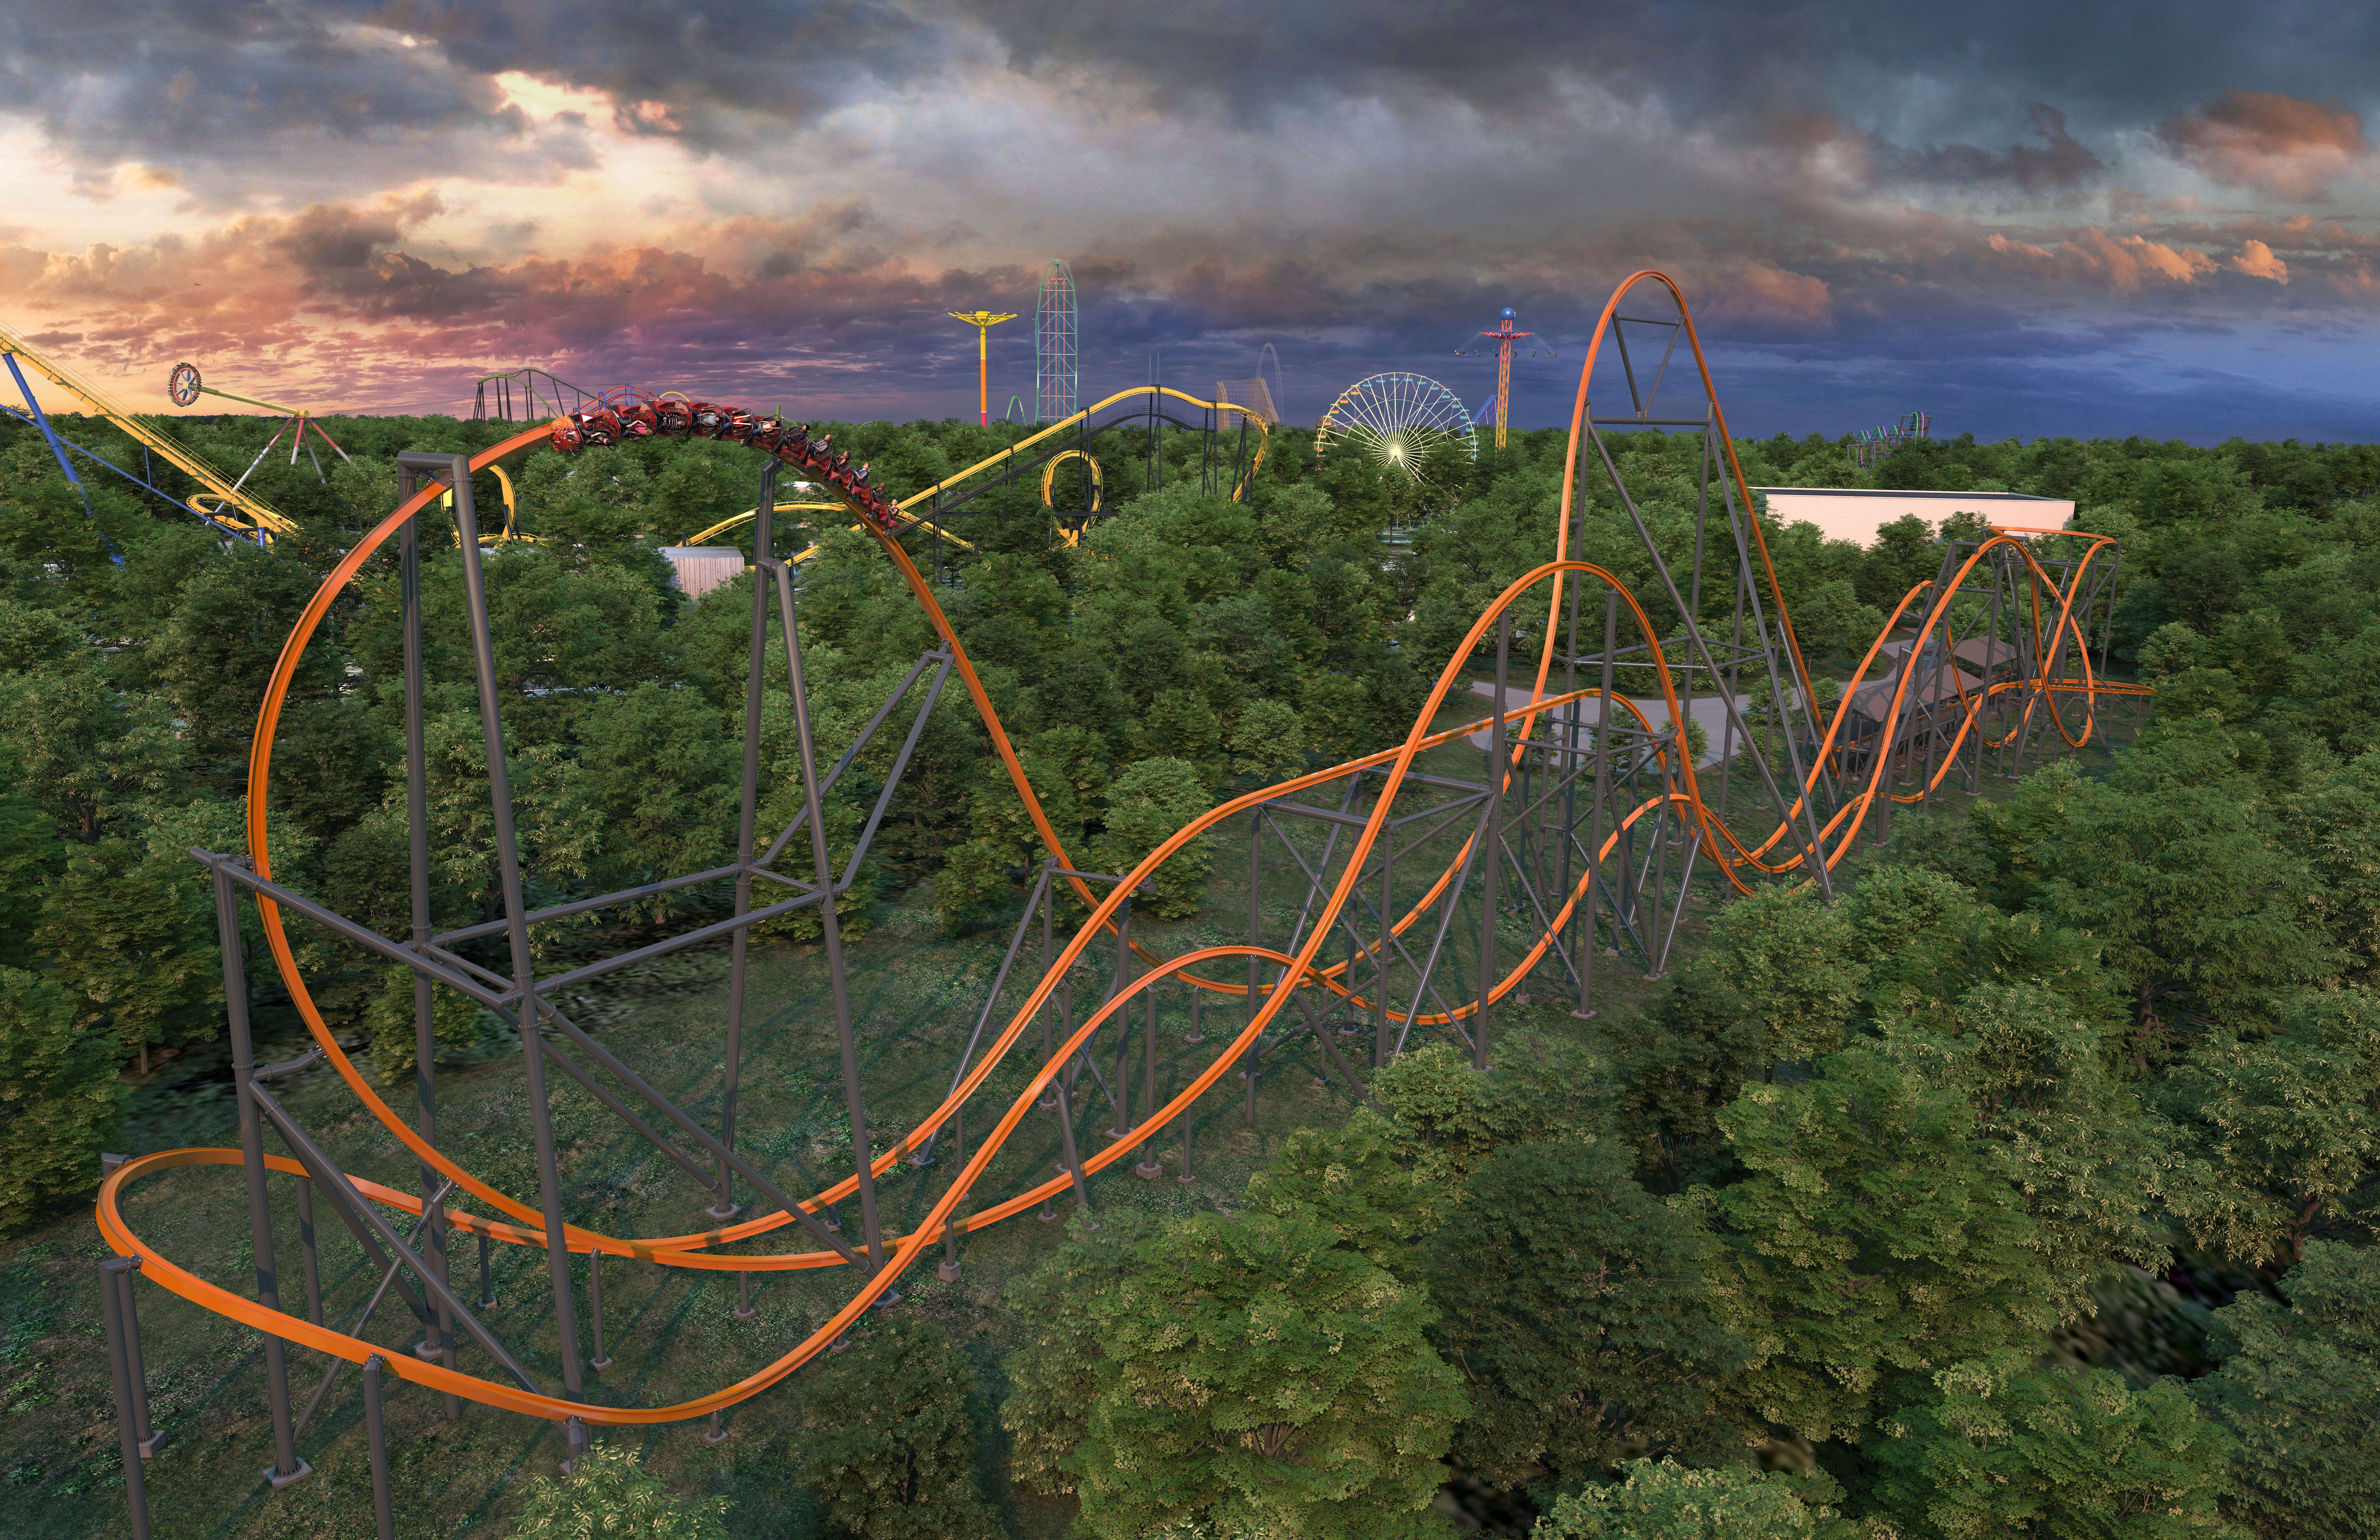 Artist's rendering of Six Flags Great Adventure's Jersey Devil Coaster.